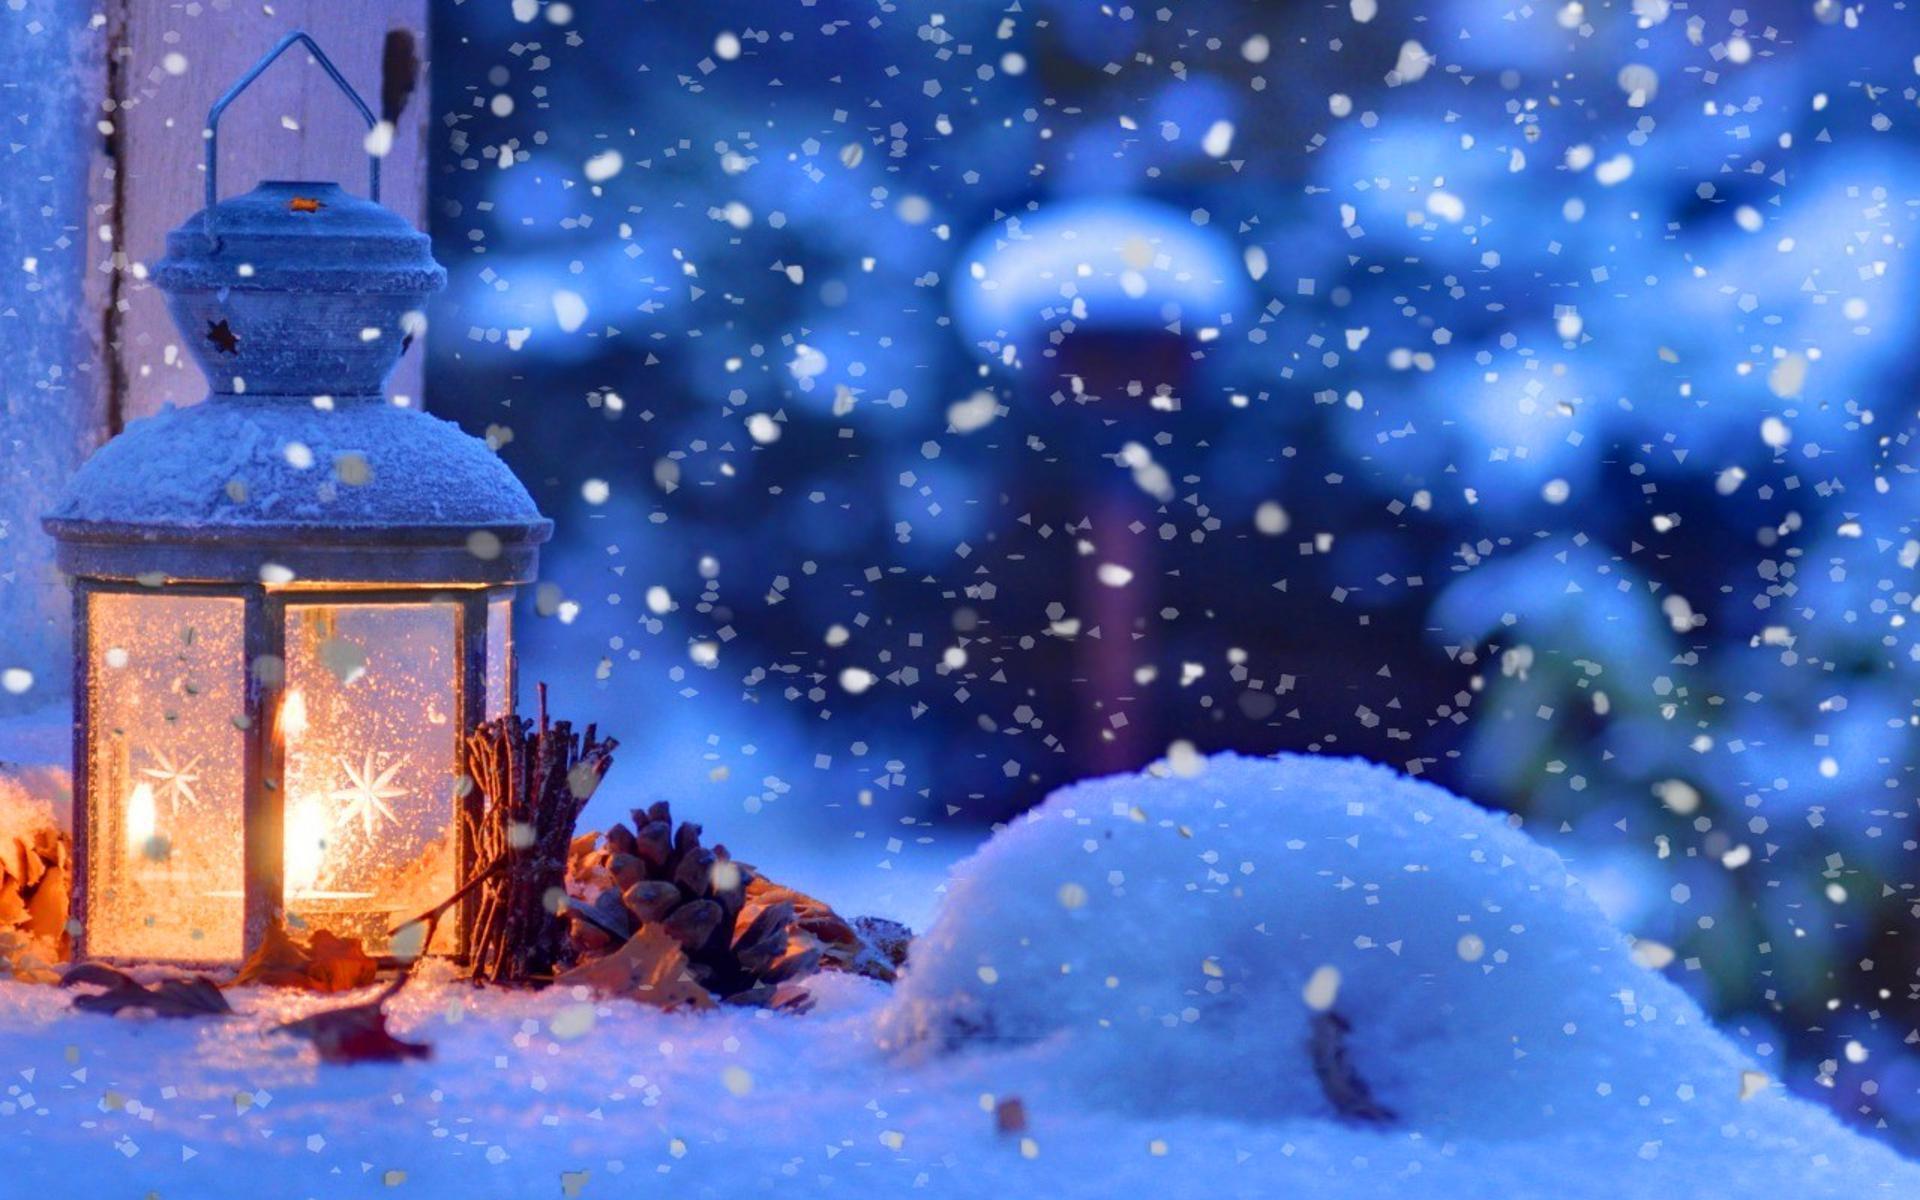 Microsoft Animated Wallpaper Winter Laterne Hd Desktop Hintergrund Widescreen High